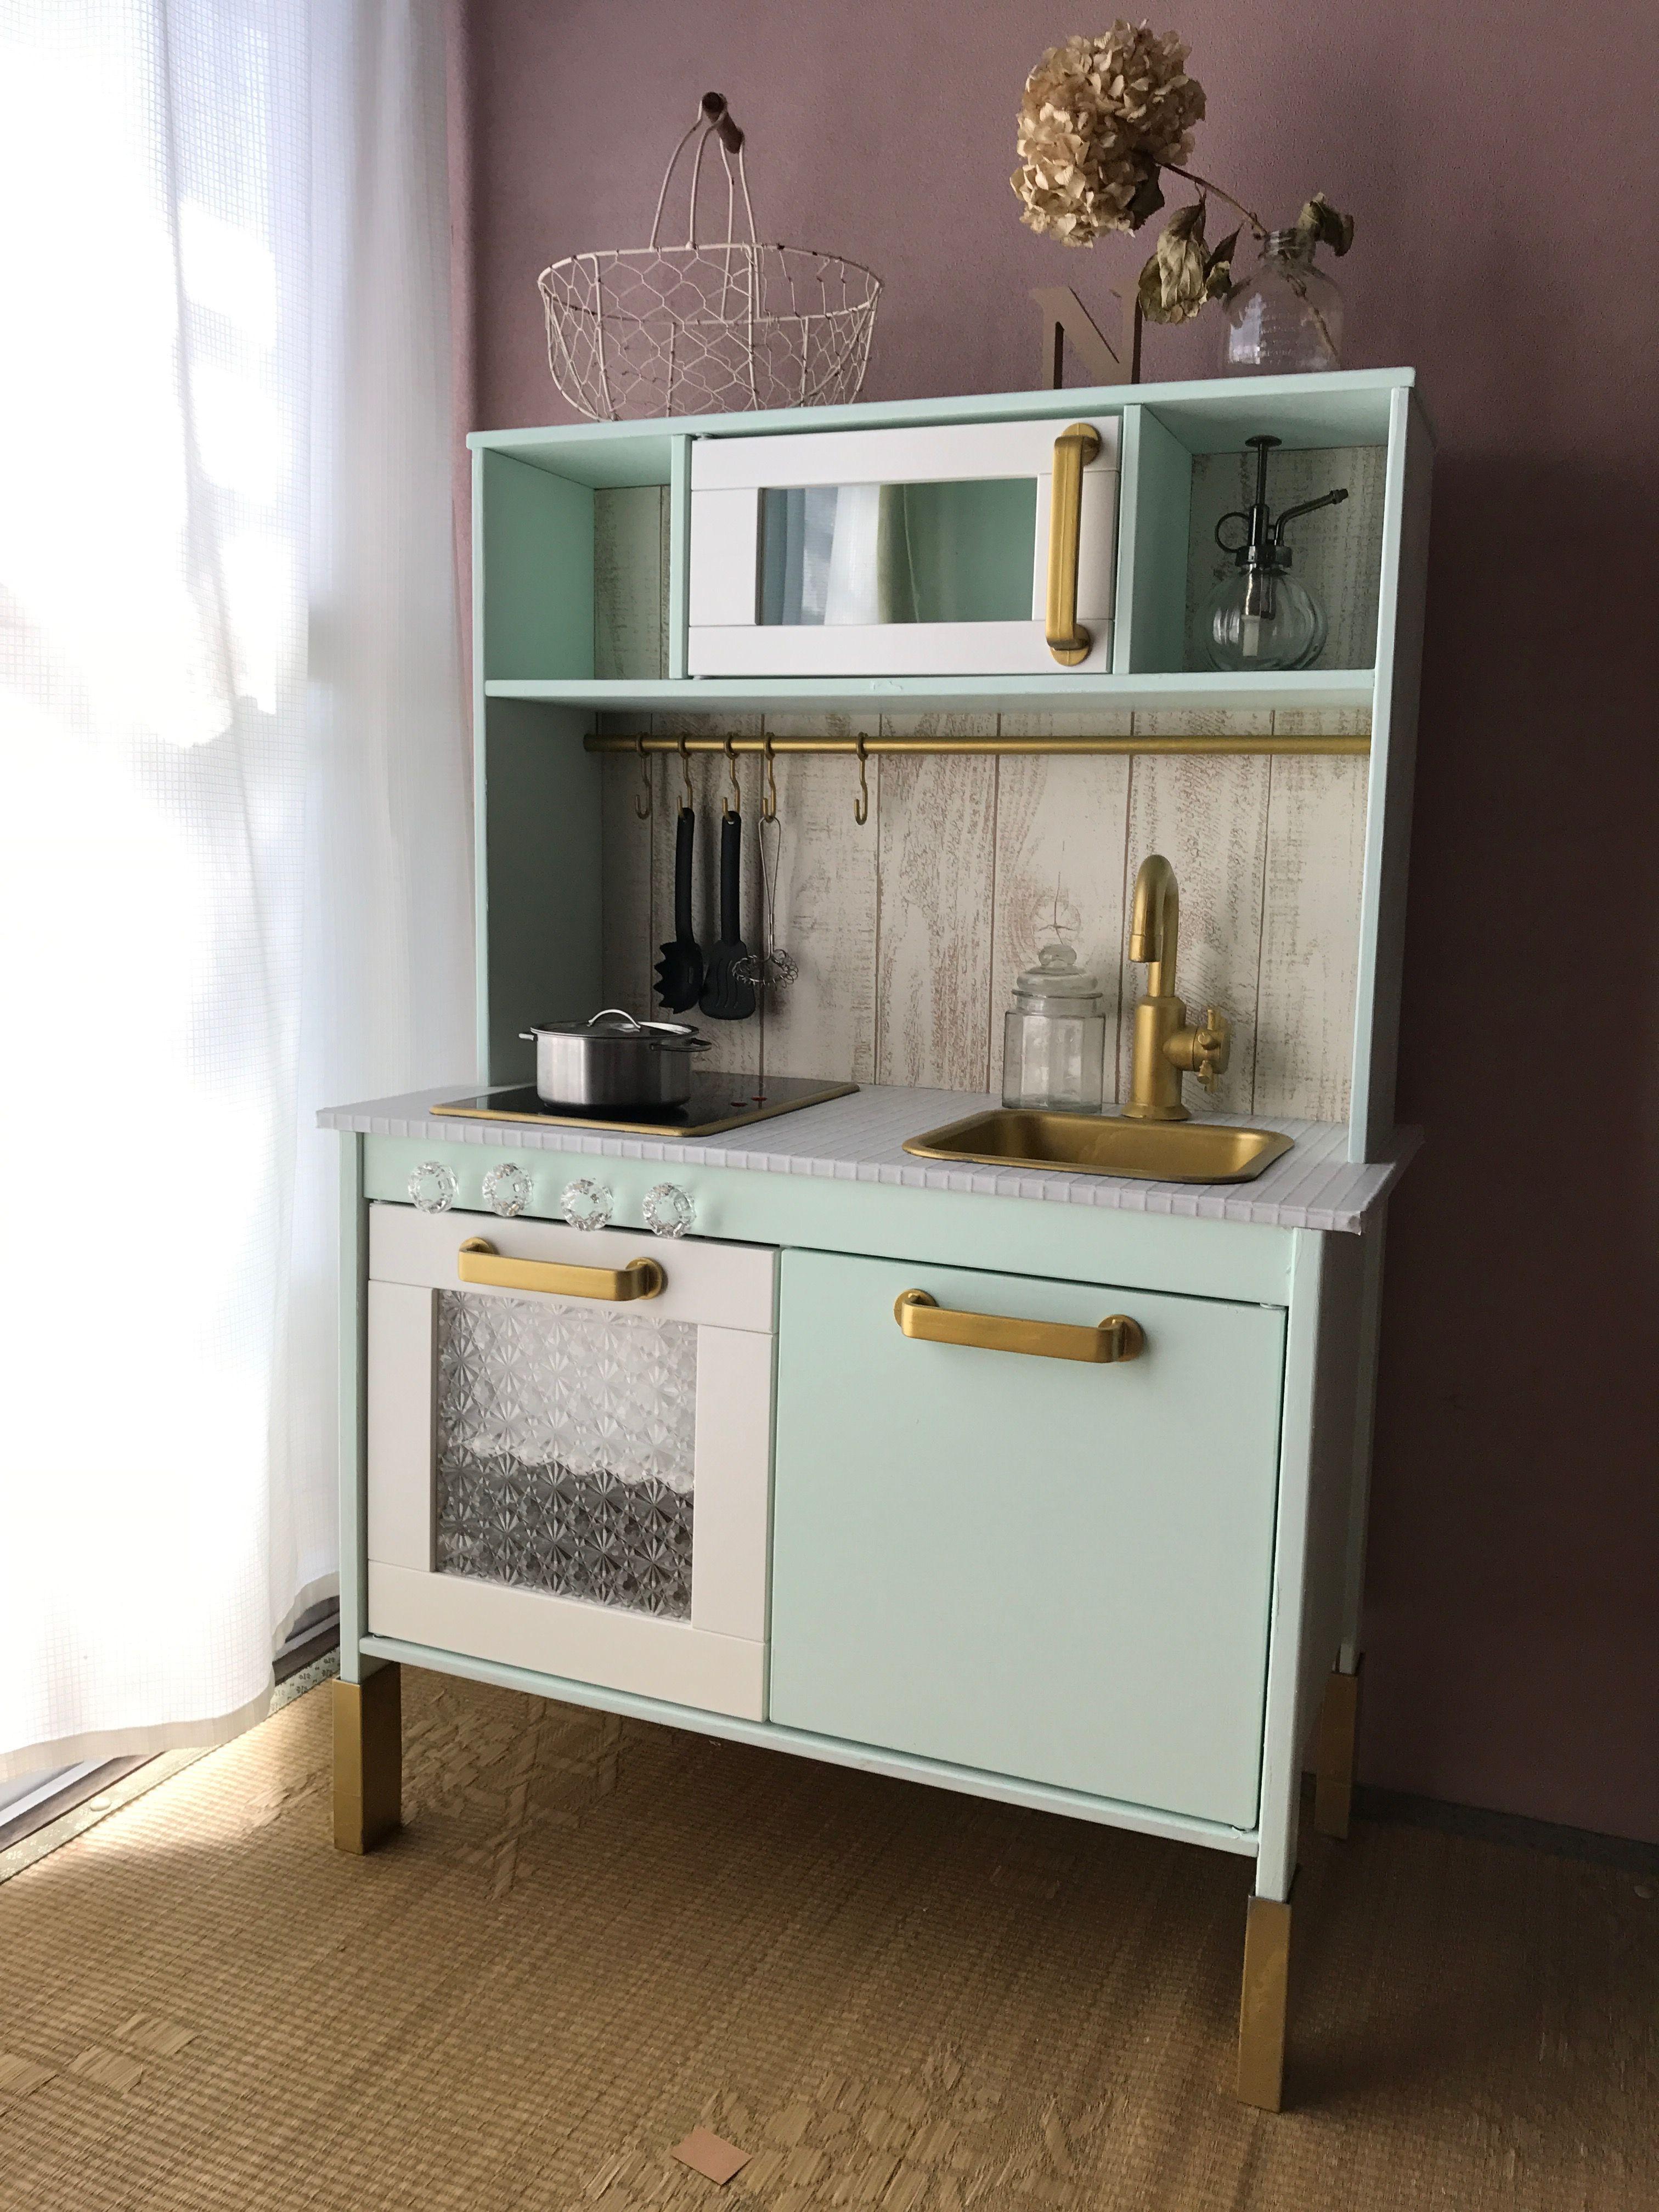 10+ Inexpensive Kitchen Design Layout Floor Plan Ideas en